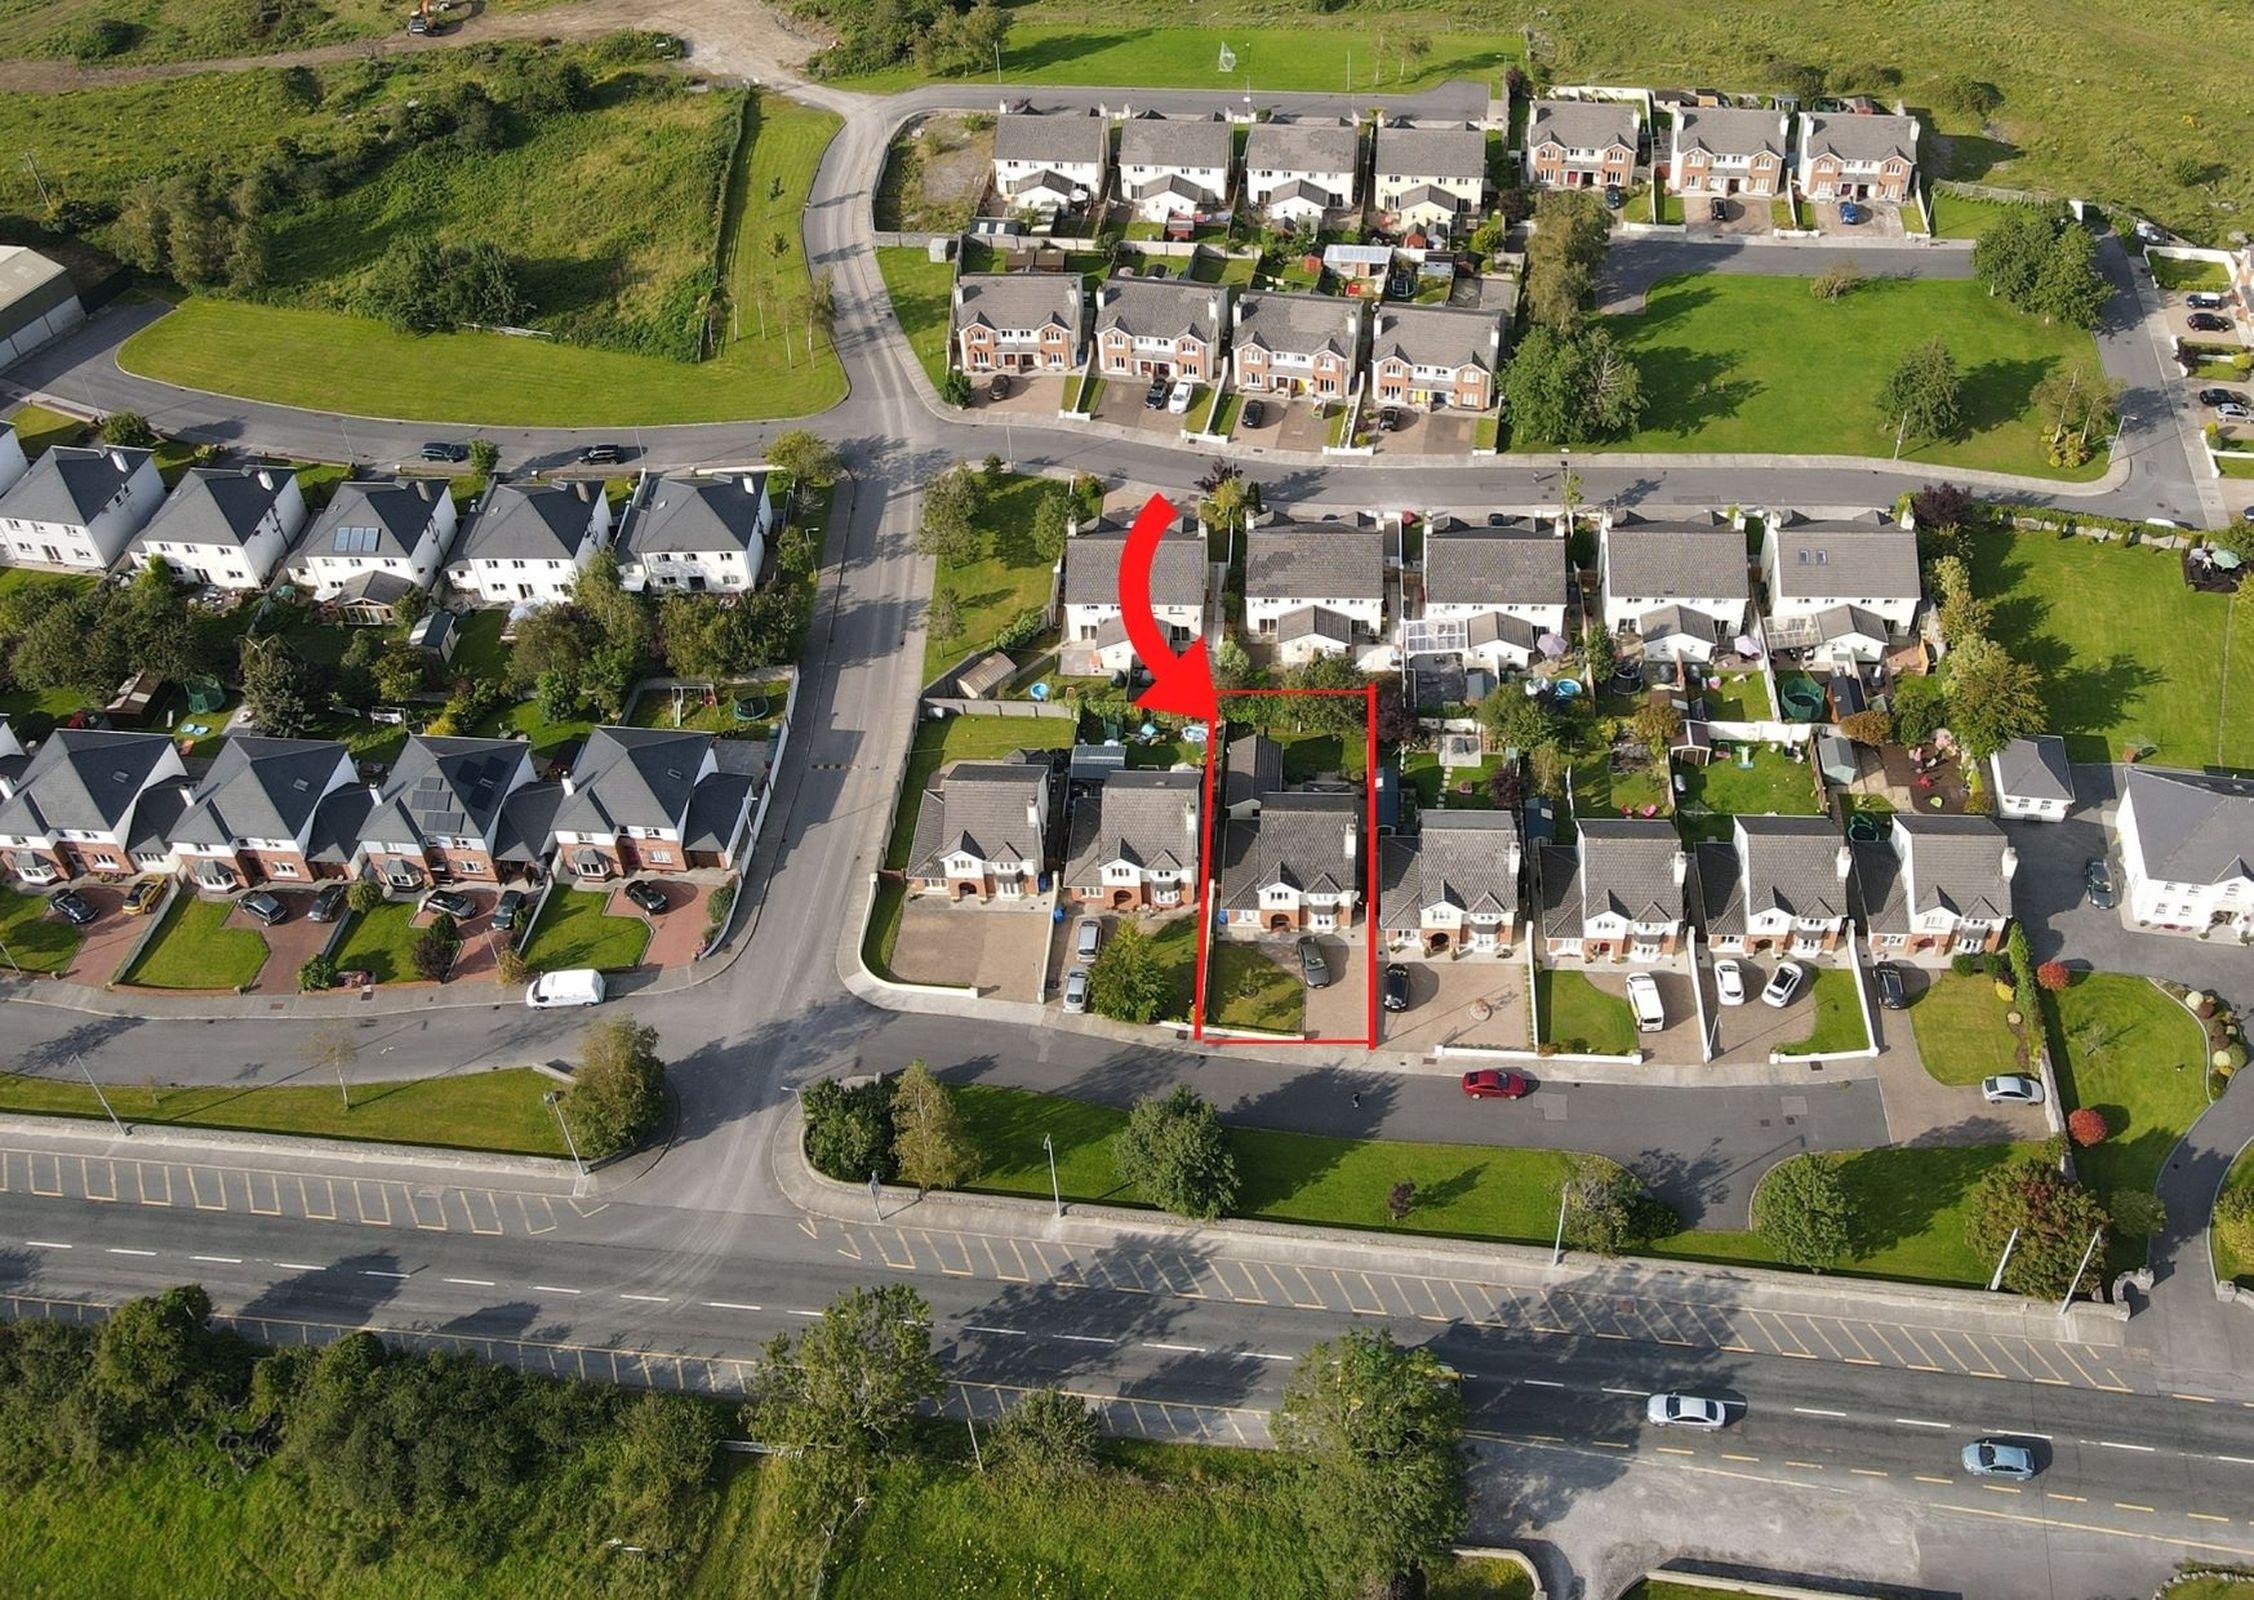 17 Dunard, Craughwell, Co. Galway